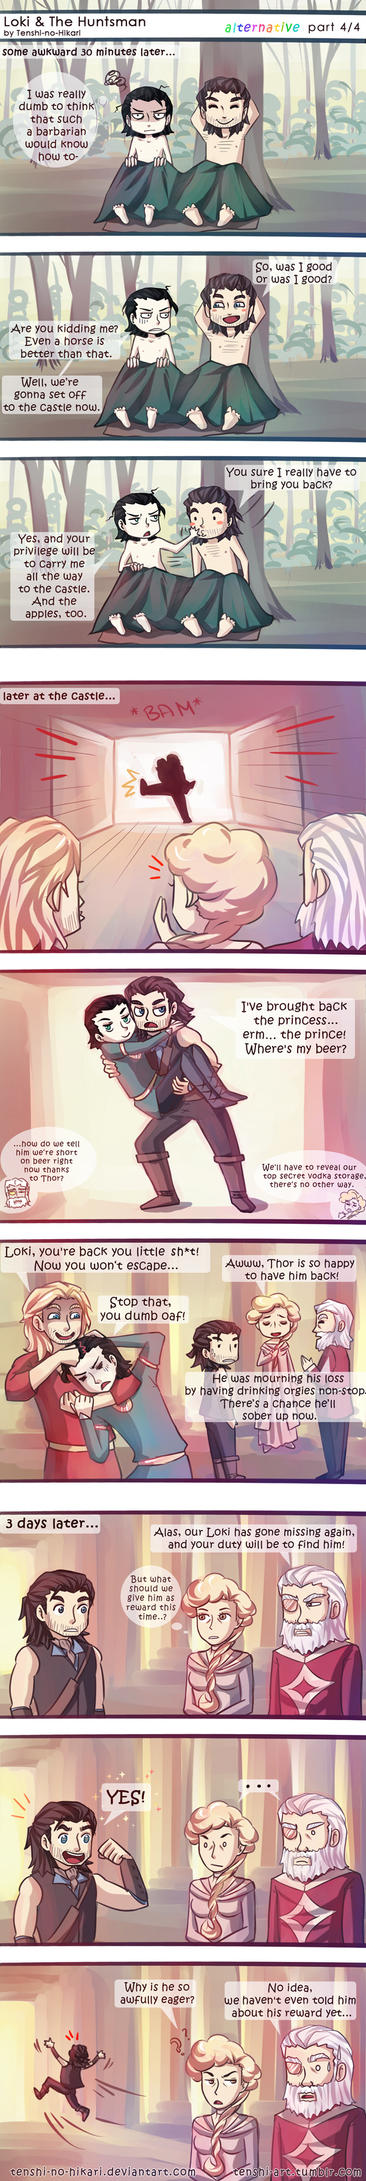 Loki and The Huntsman -alternative part 04- by Tenshi-no-Hikari